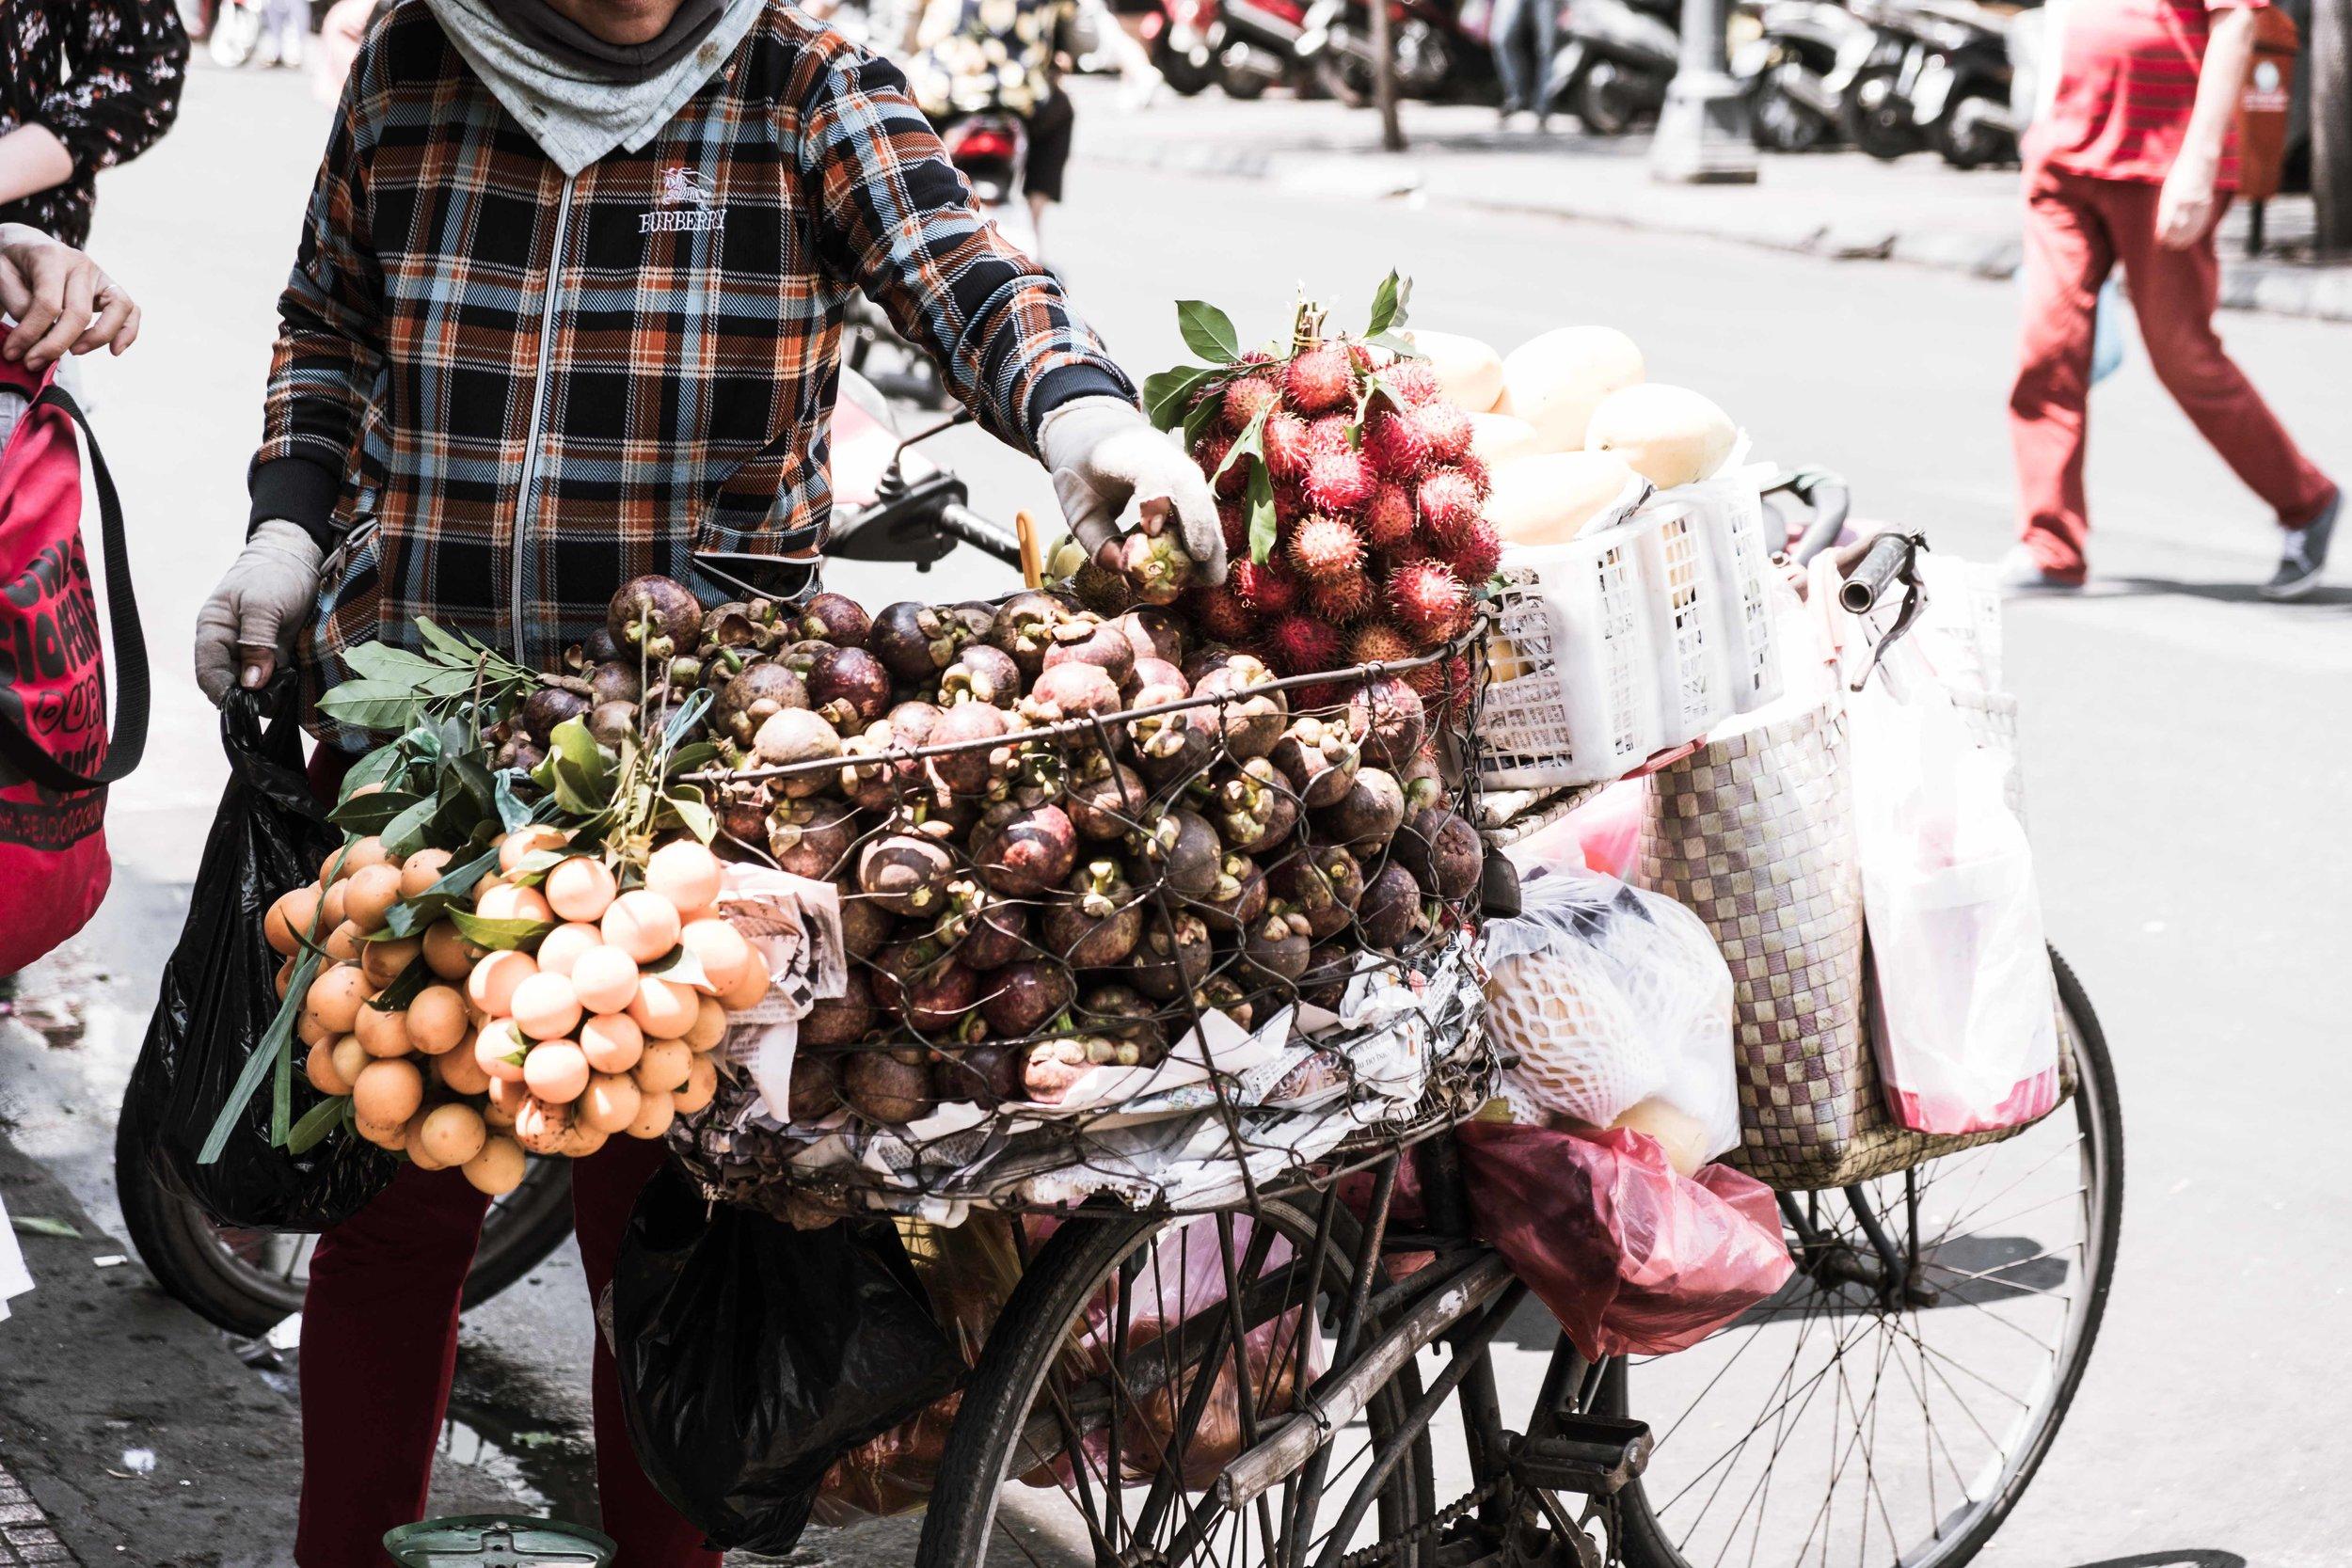 Saigon Ben Than Market